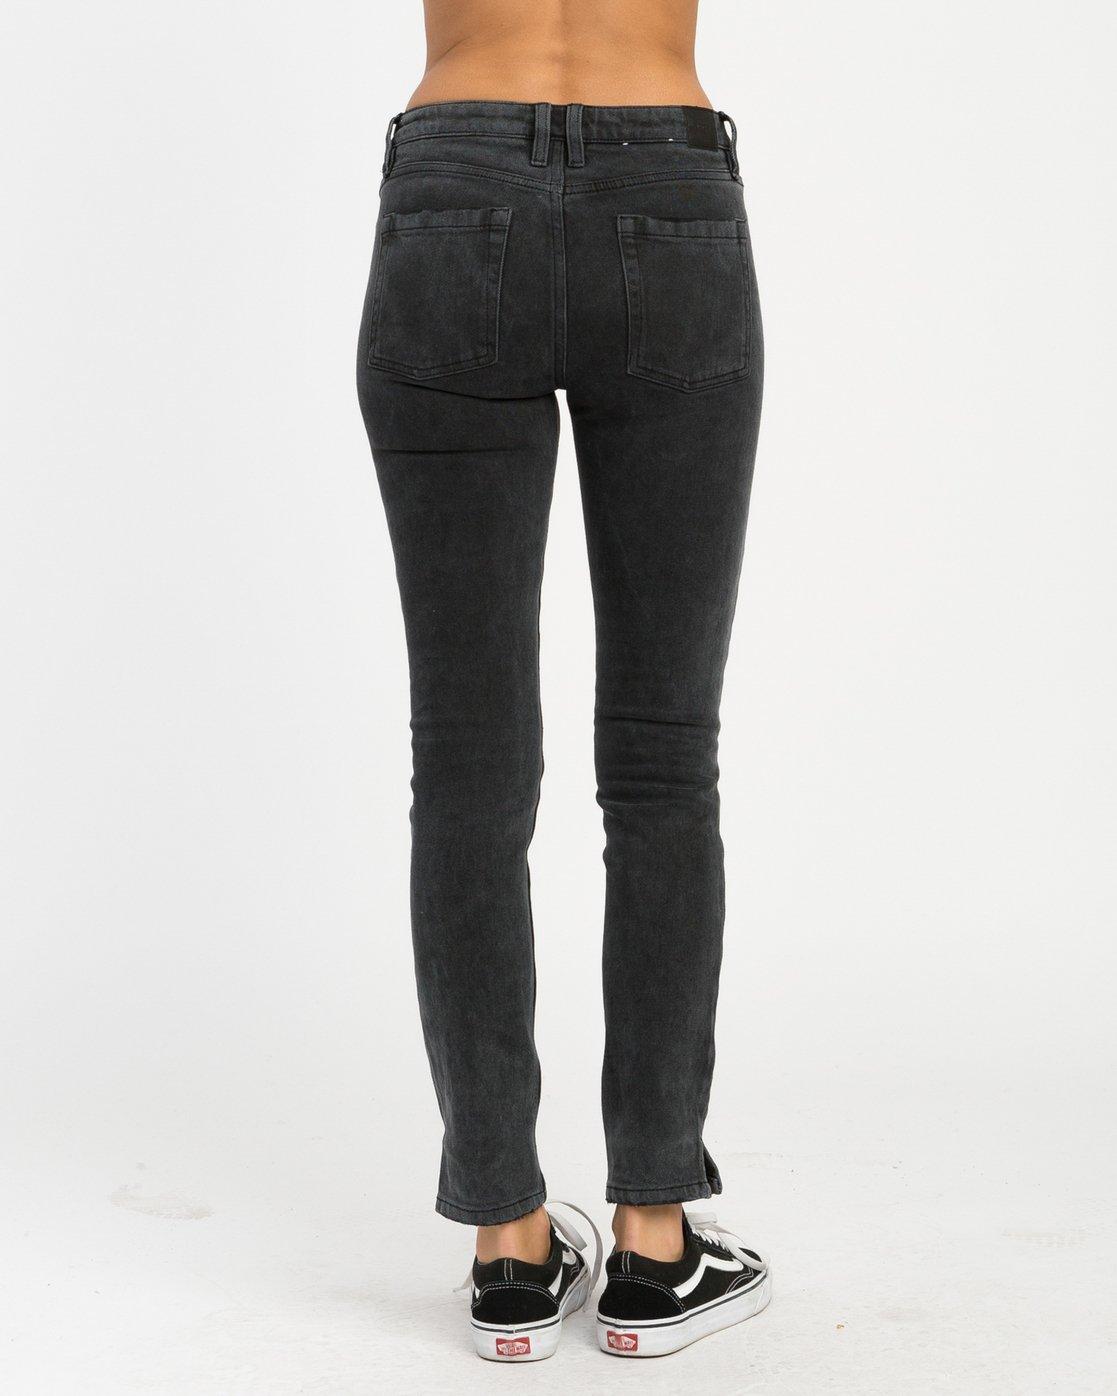 4 Dayley Mid Rise Denim Jeans Black WCDP02DA RVCA